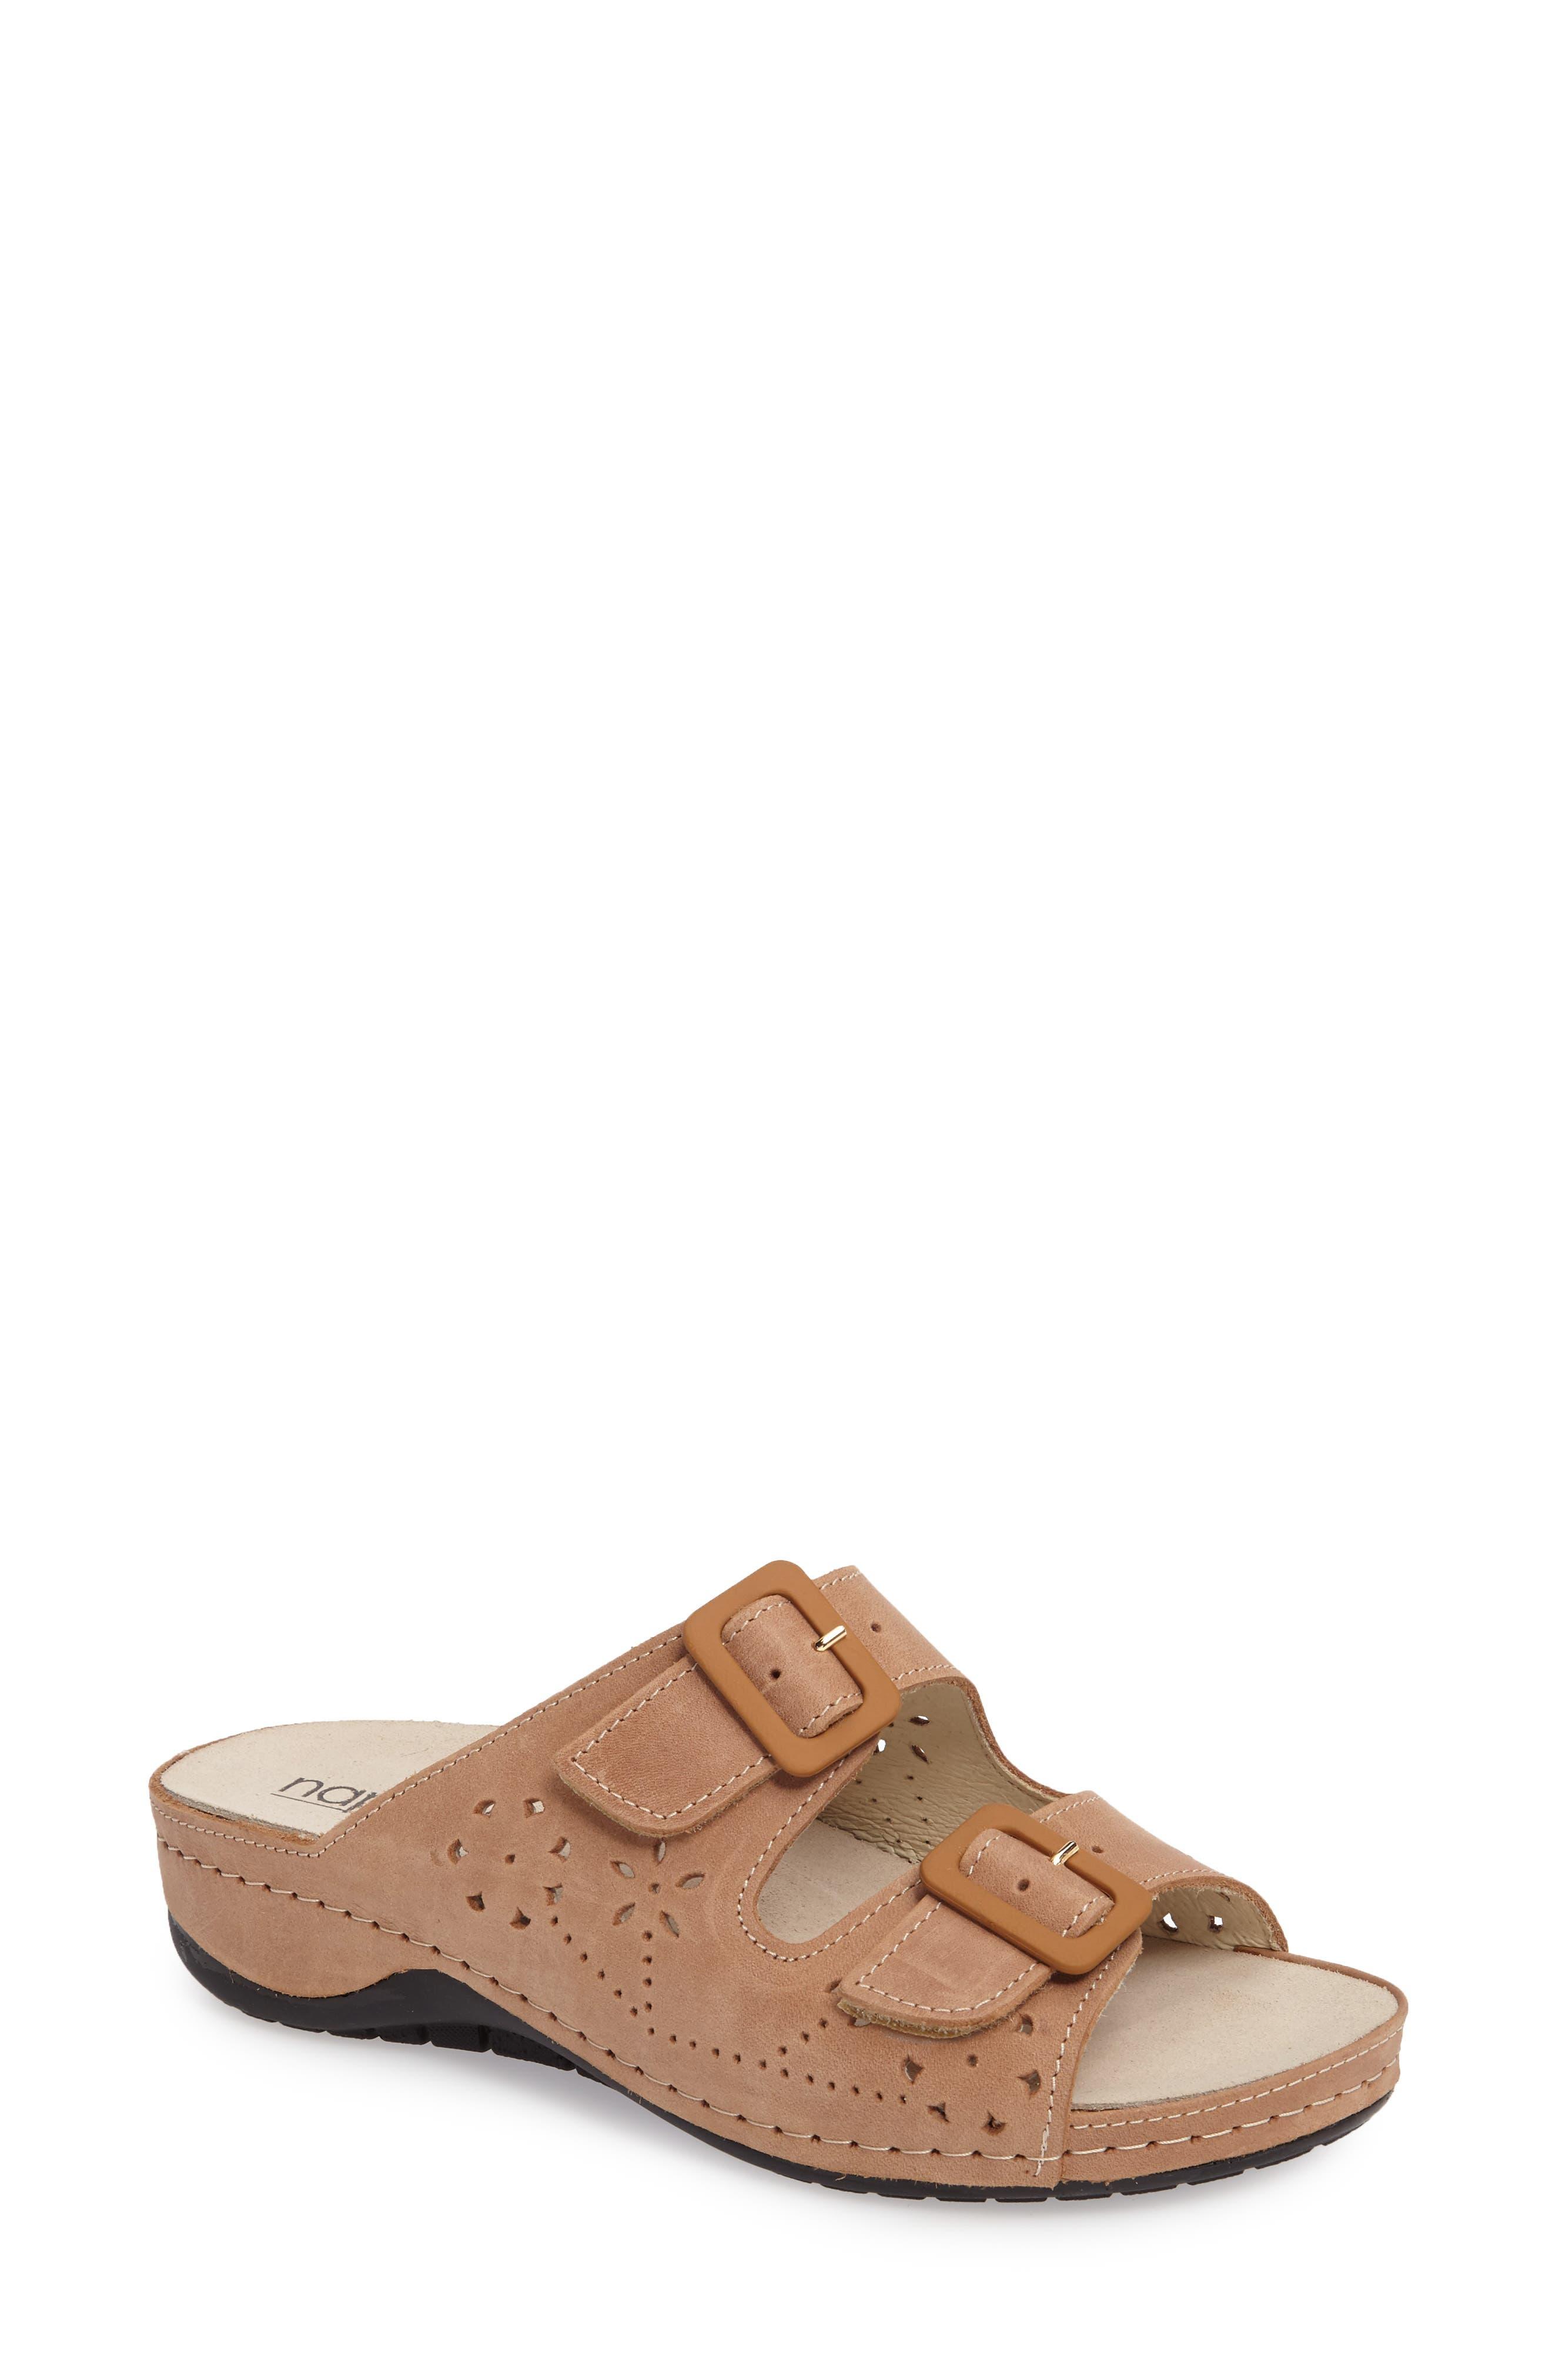 Main Image - Napa Flex Double Strap Slide Sandal (Women)